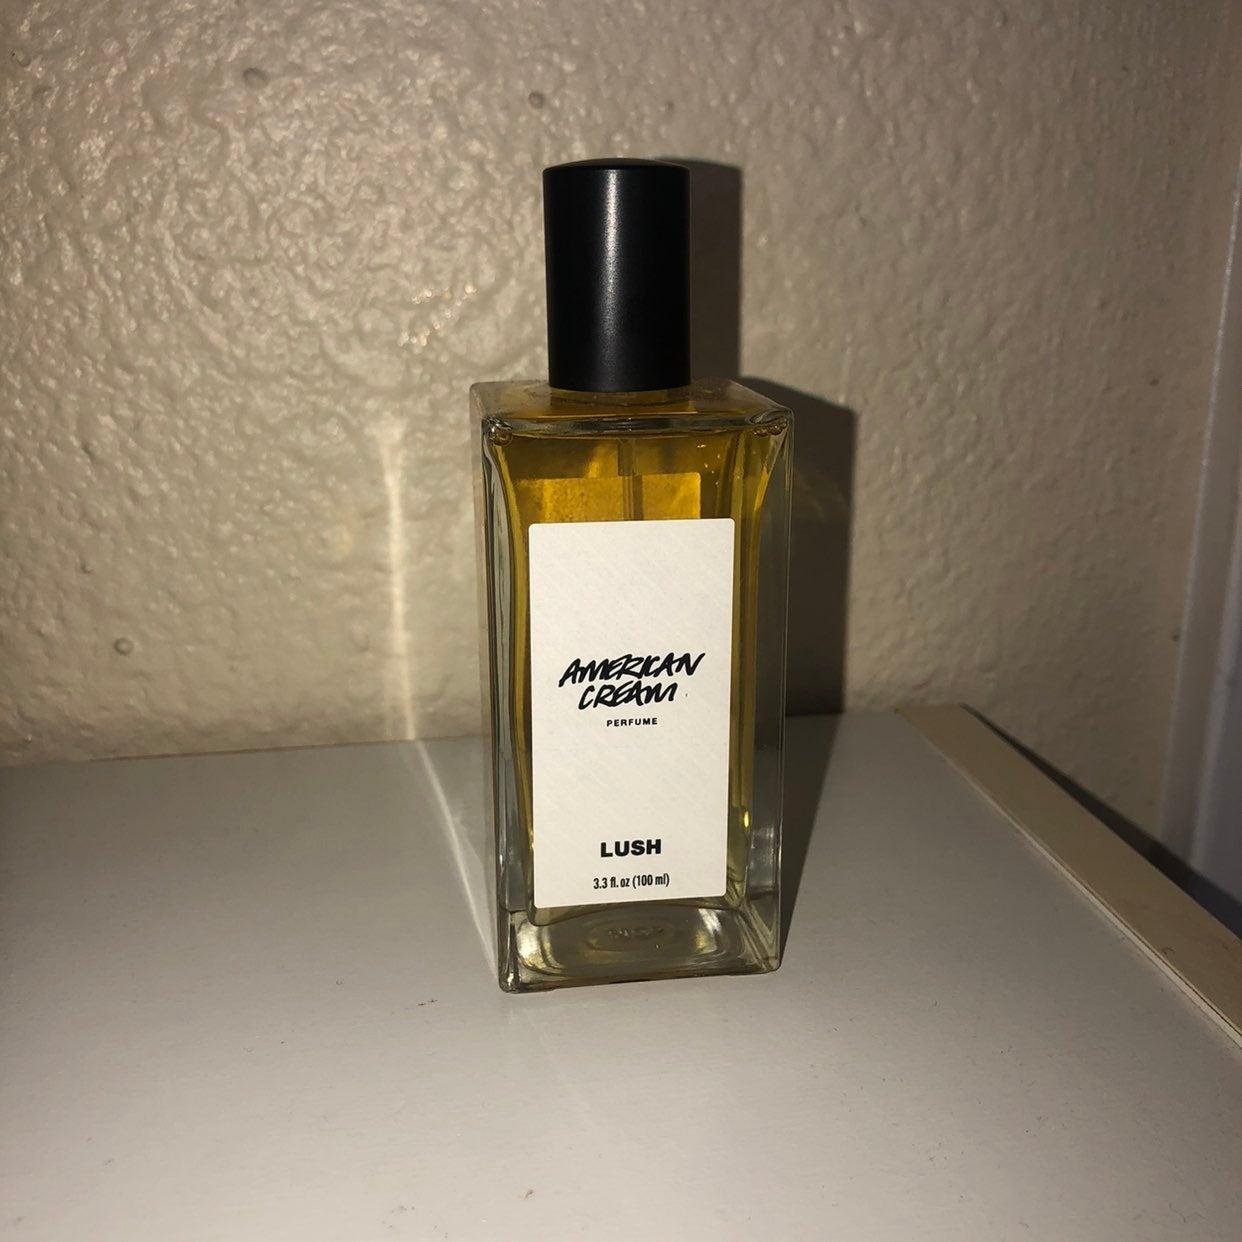 Lush American Cream Perfume 3.3